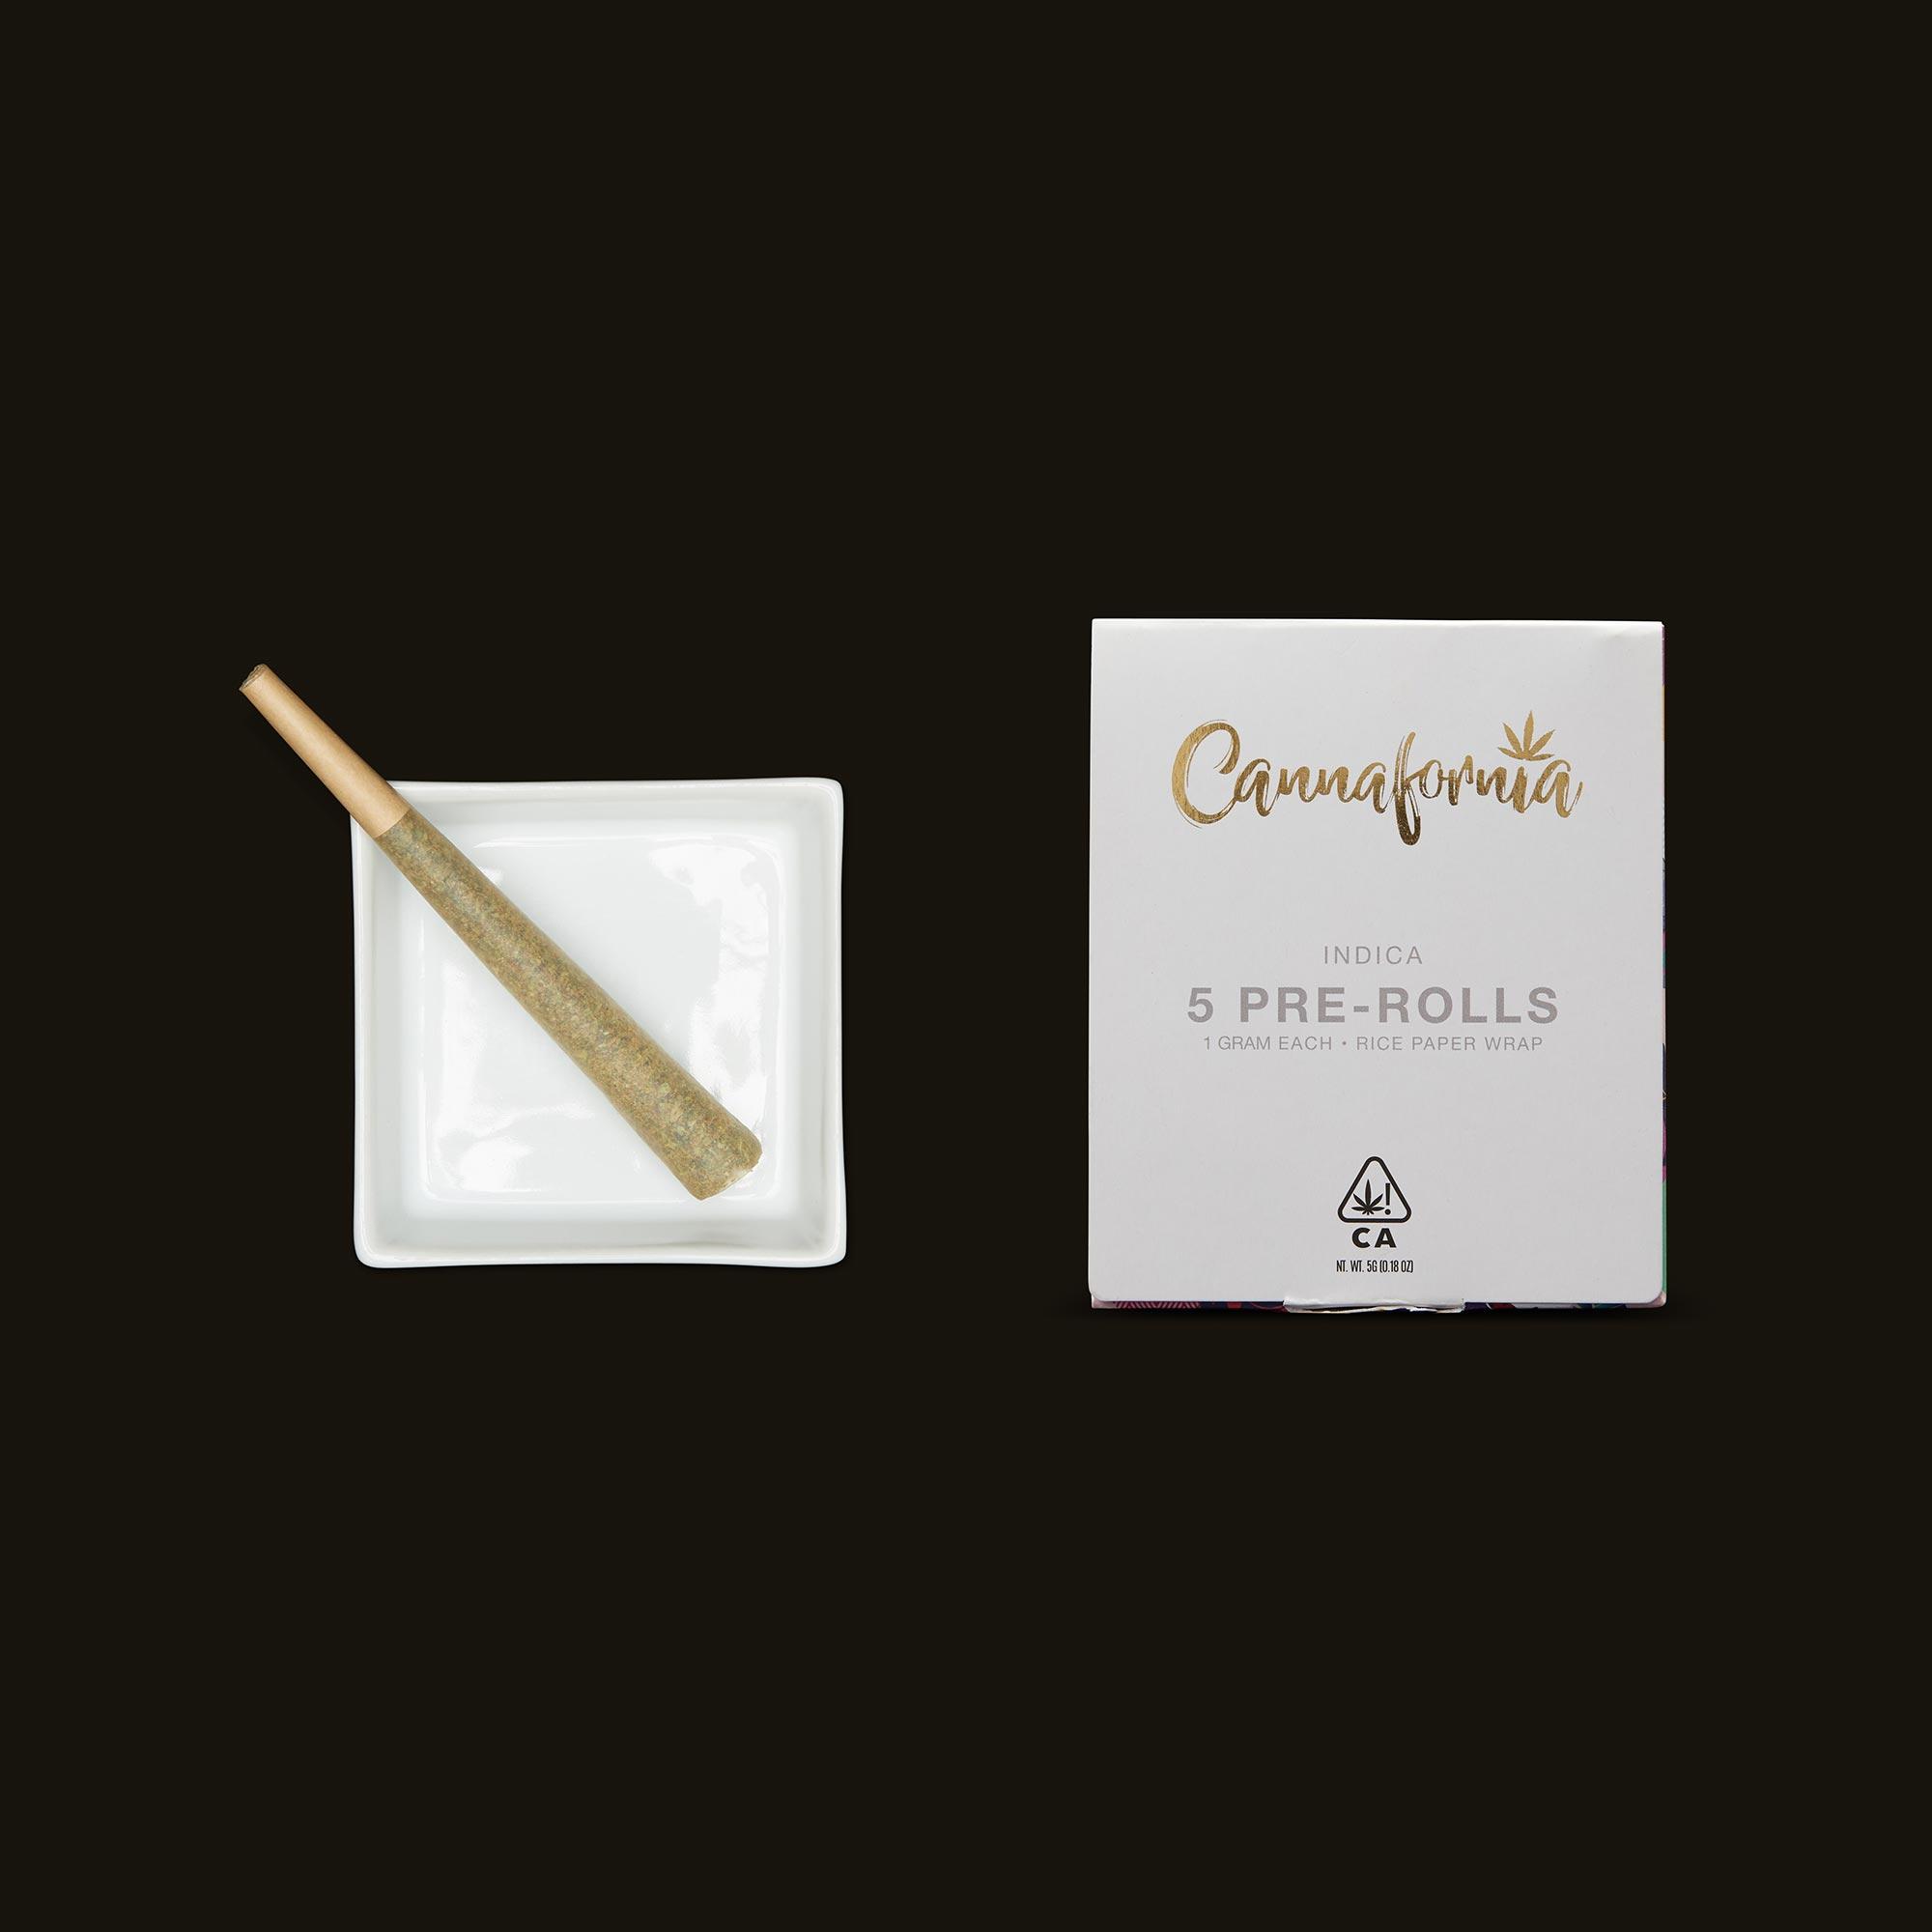 Slurricane Pre-Roll box and in an ashtray